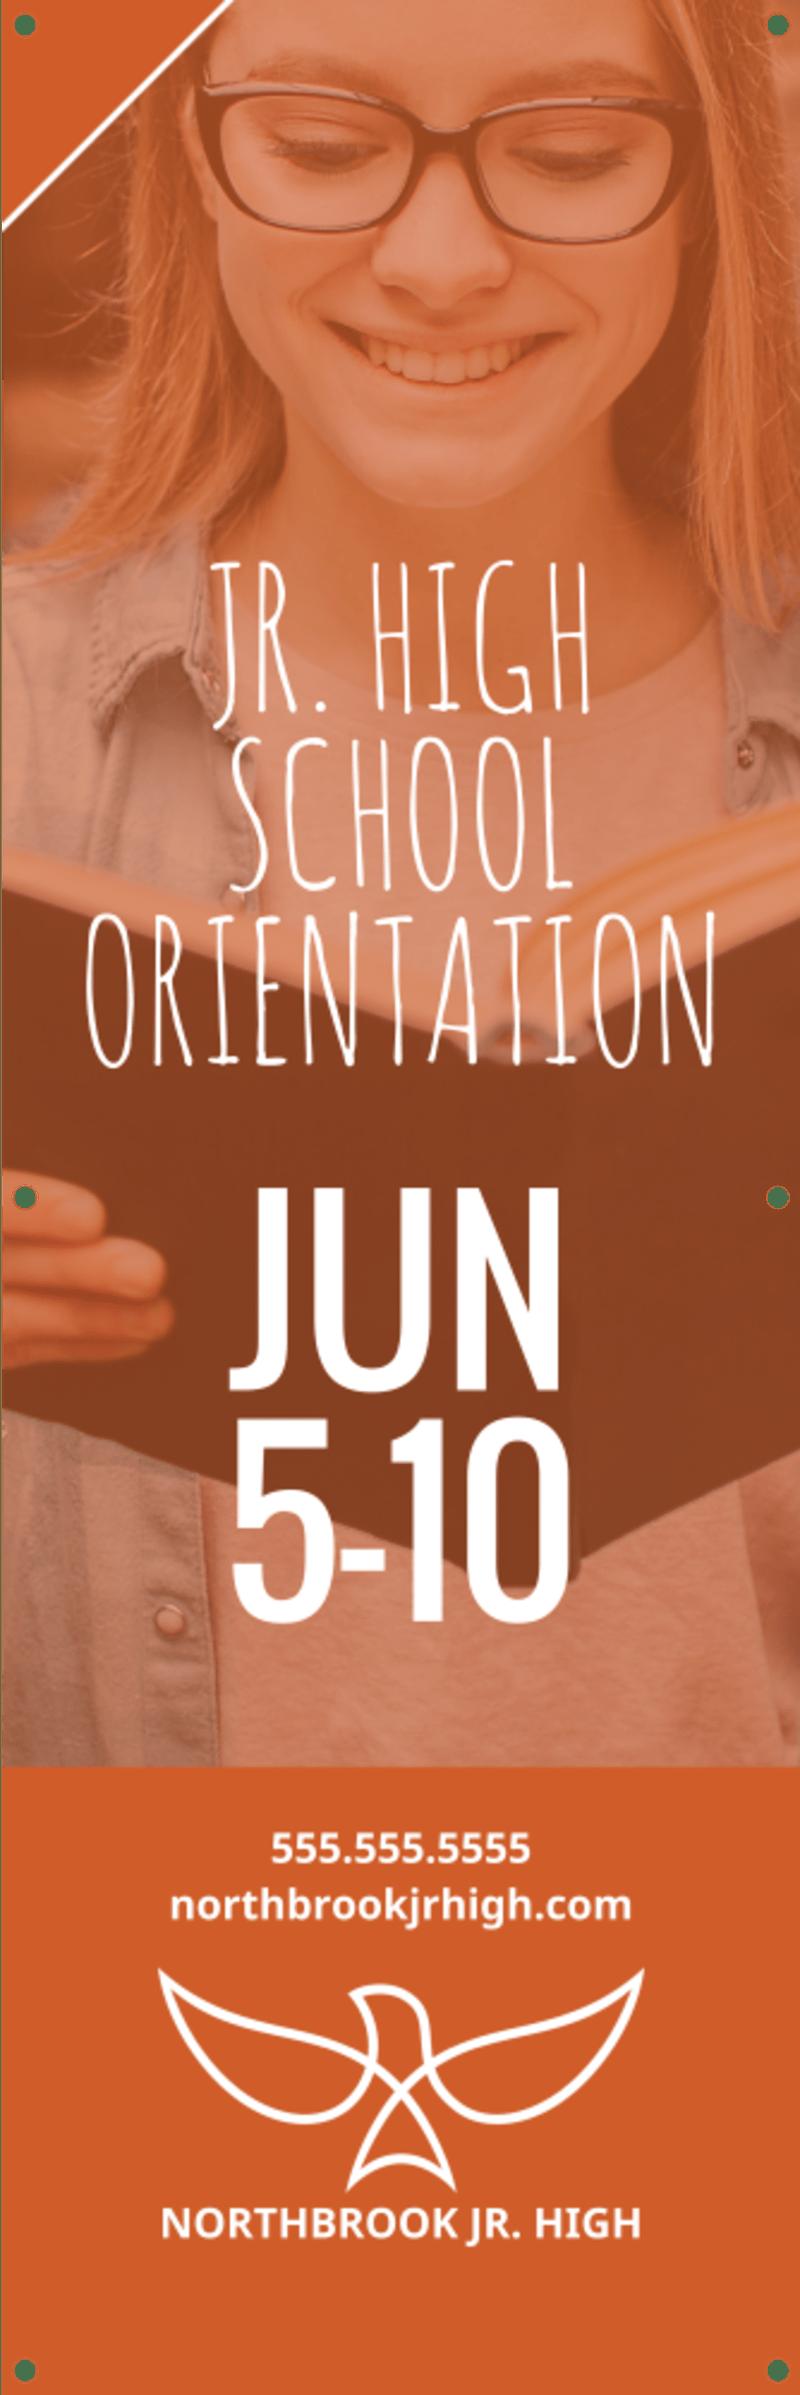 School Orientation Banner Template Preview 2